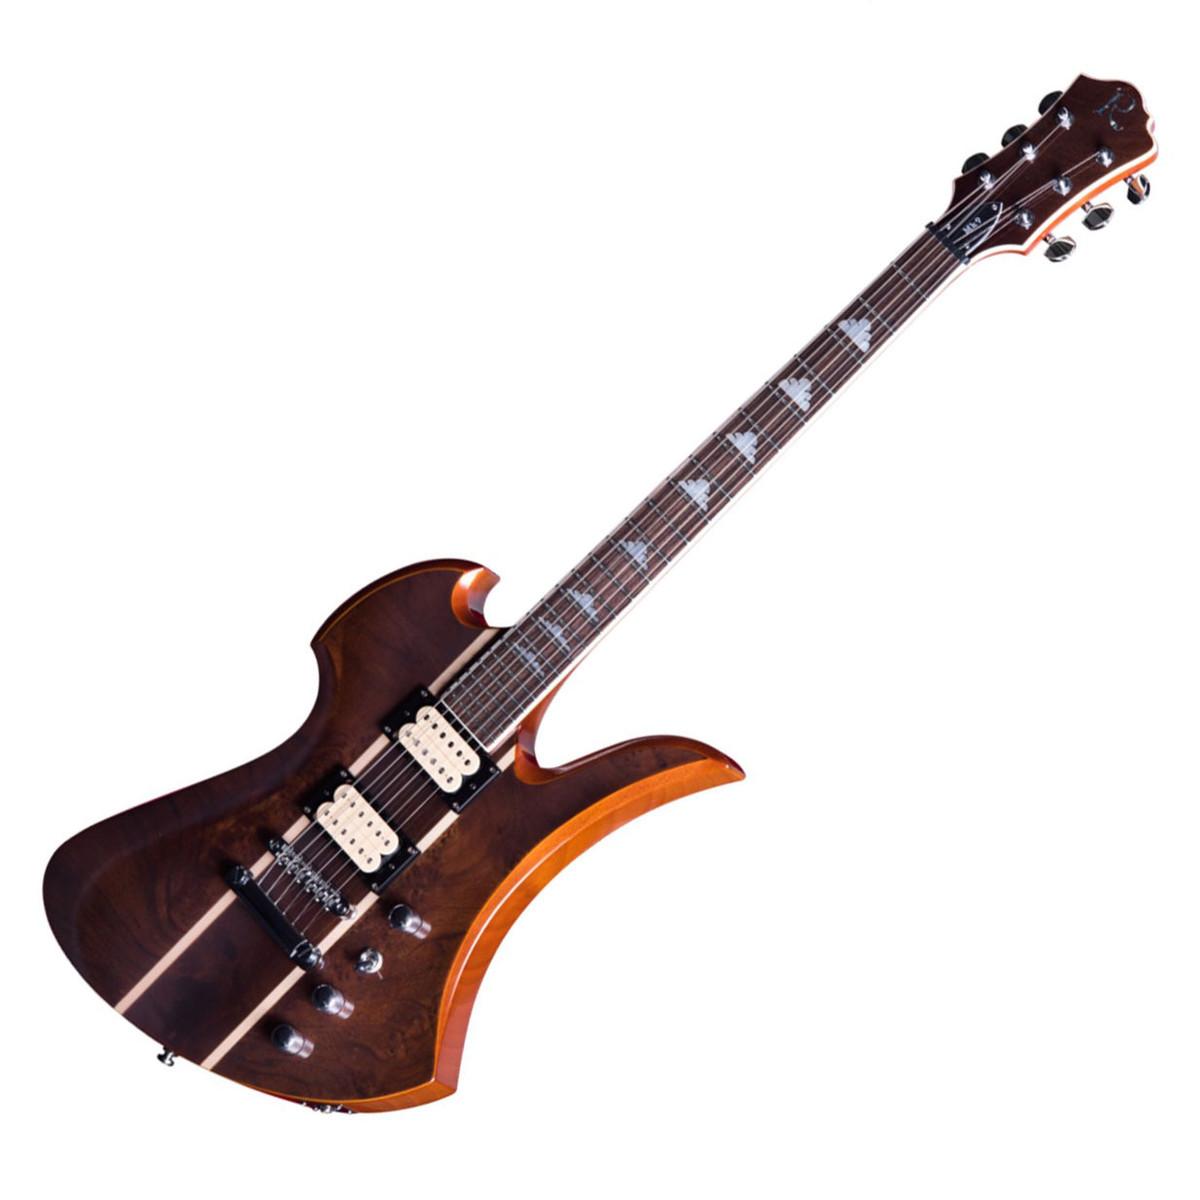 bc rich mockingbird mk9 guitar with hard case natural walnut burl at. Black Bedroom Furniture Sets. Home Design Ideas